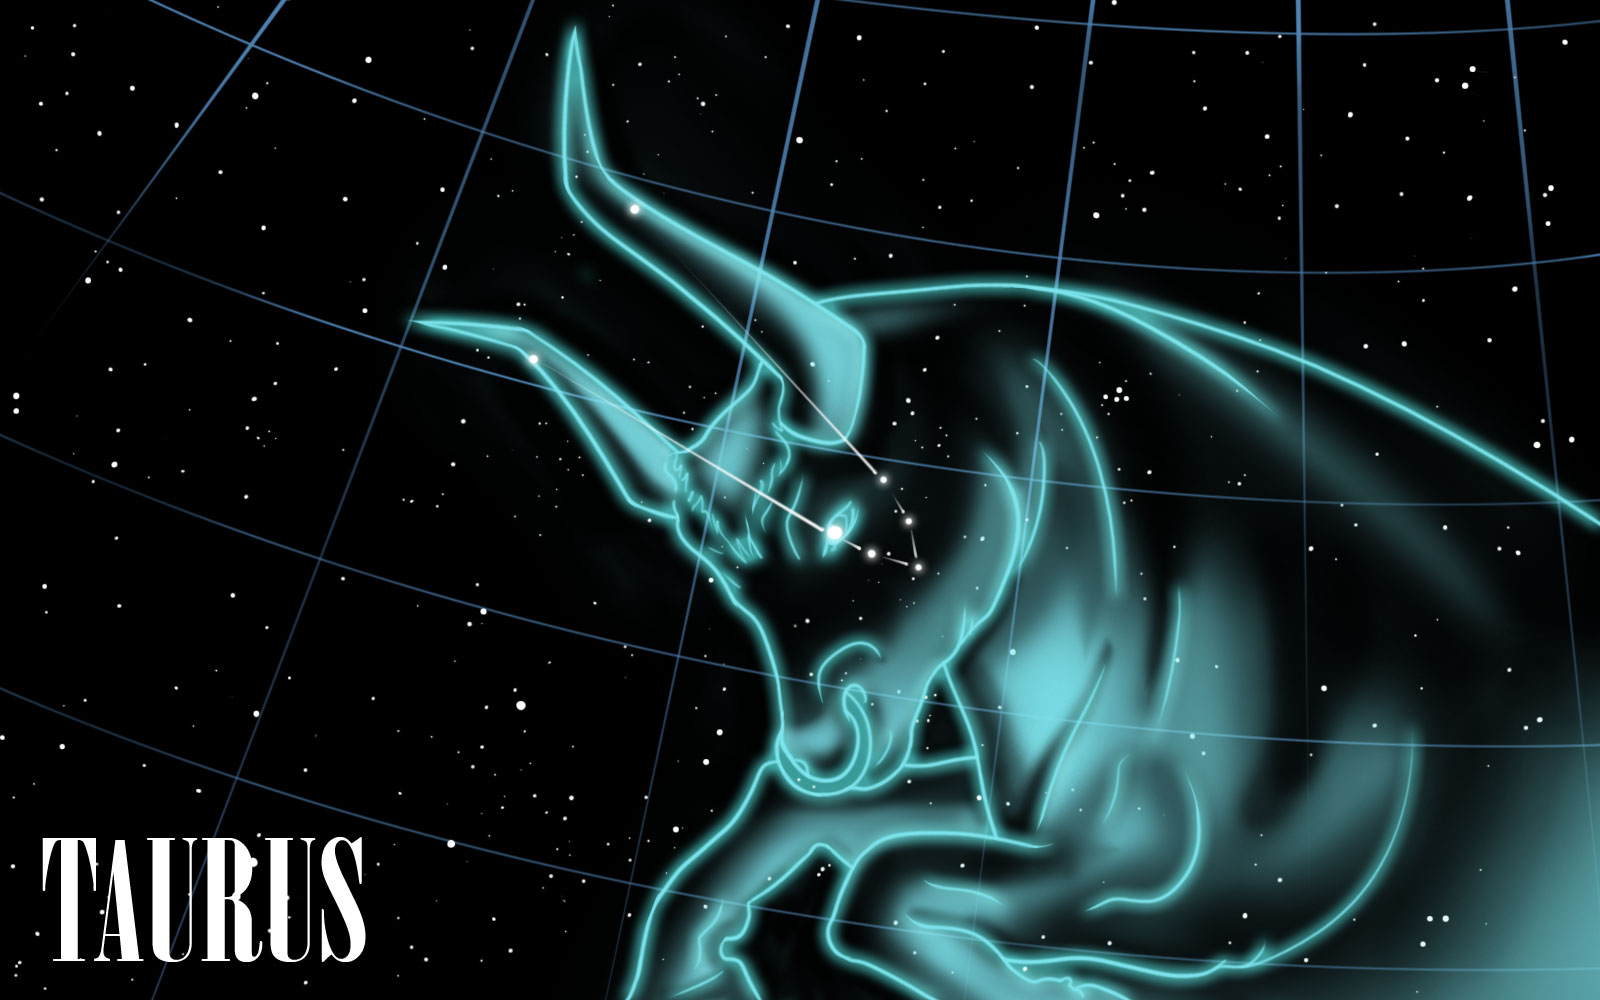 zodiac taurus hd wallpaper wallpapers55com   Best Wallpapers for 1600x1000